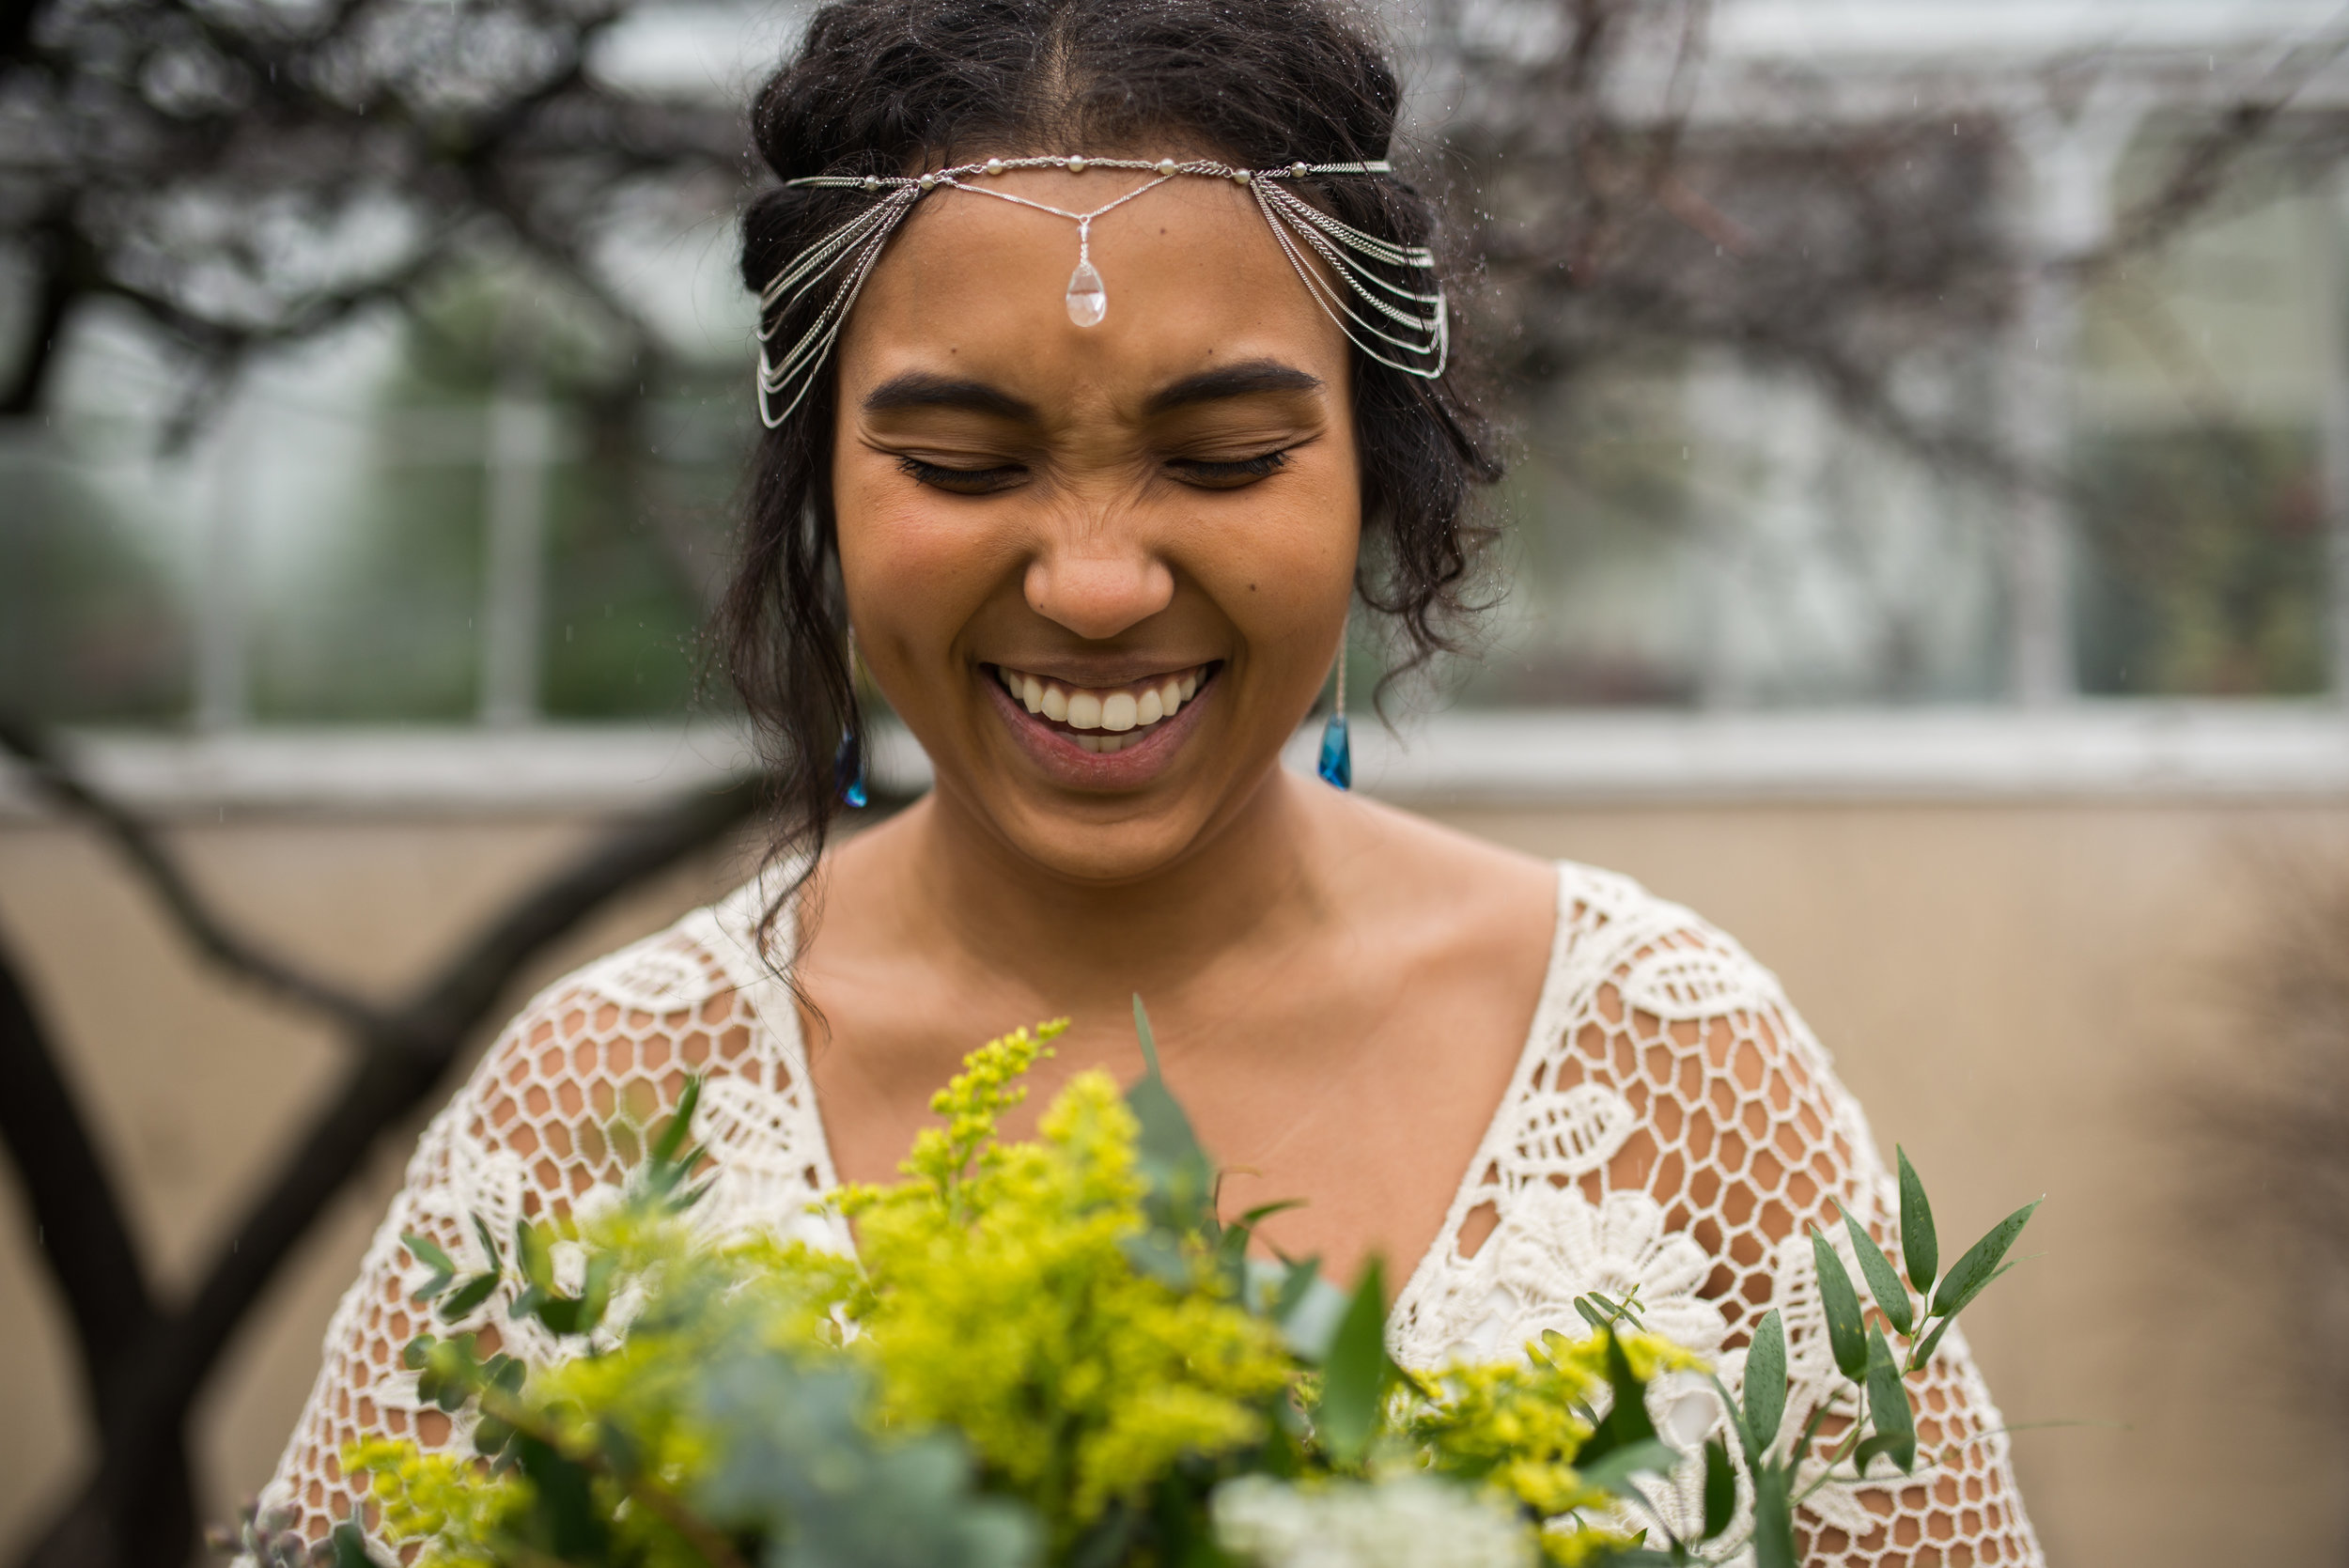 Anice Bridal Jewellery in Toronto Ontario with Soundslikeyellowphotography